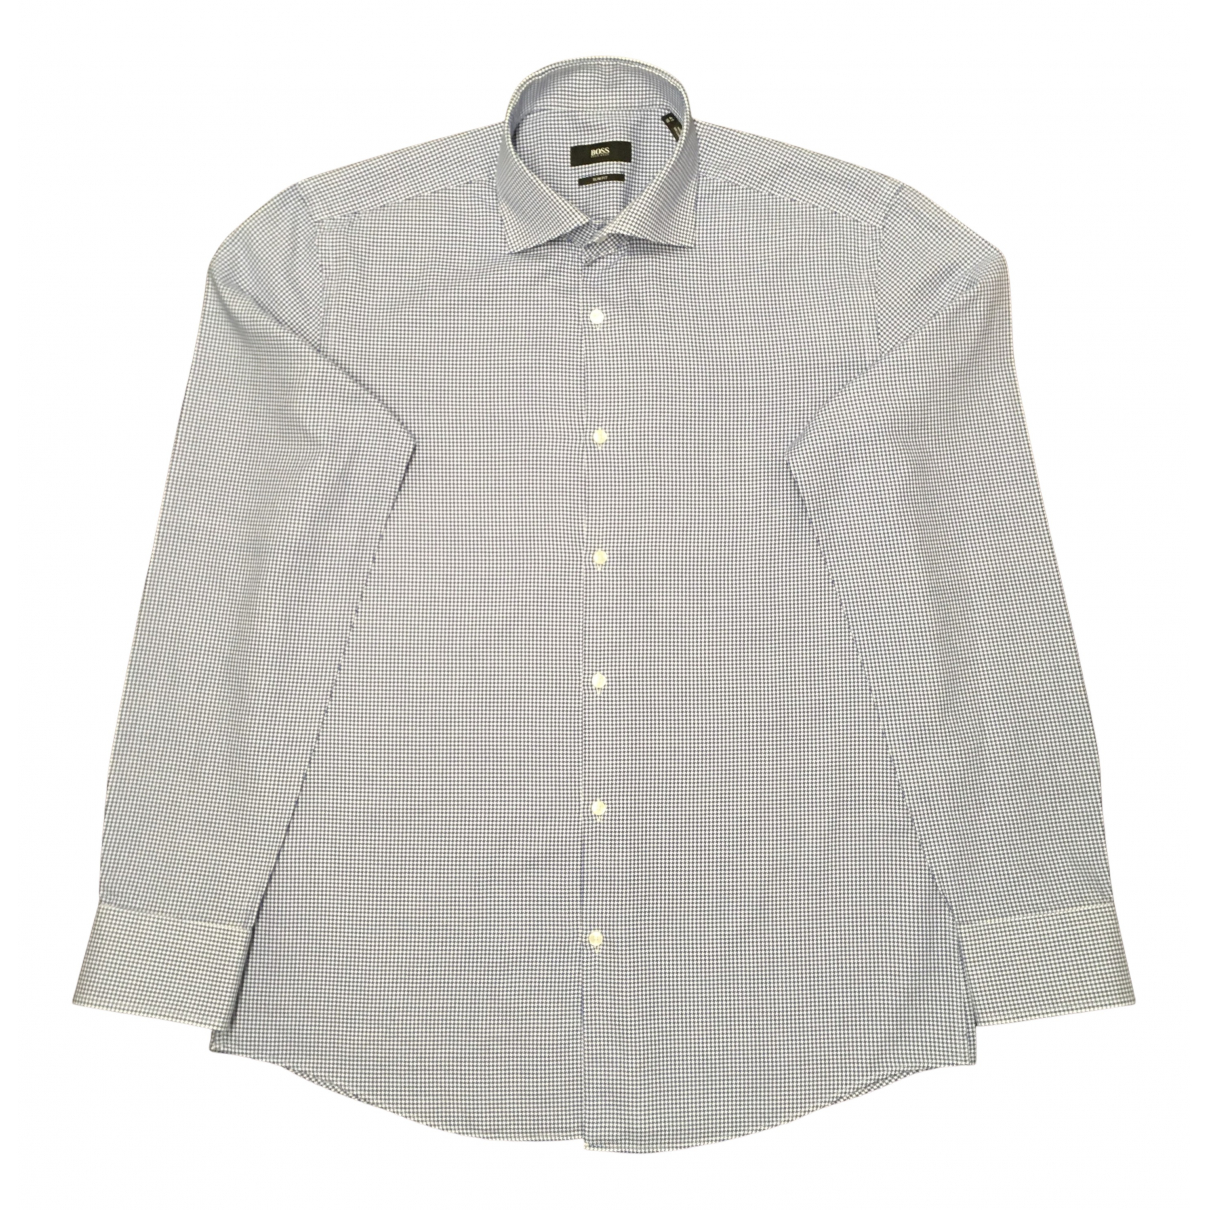 Boss N Blue Cotton Shirts for Men 41 EU (tour de cou / collar)